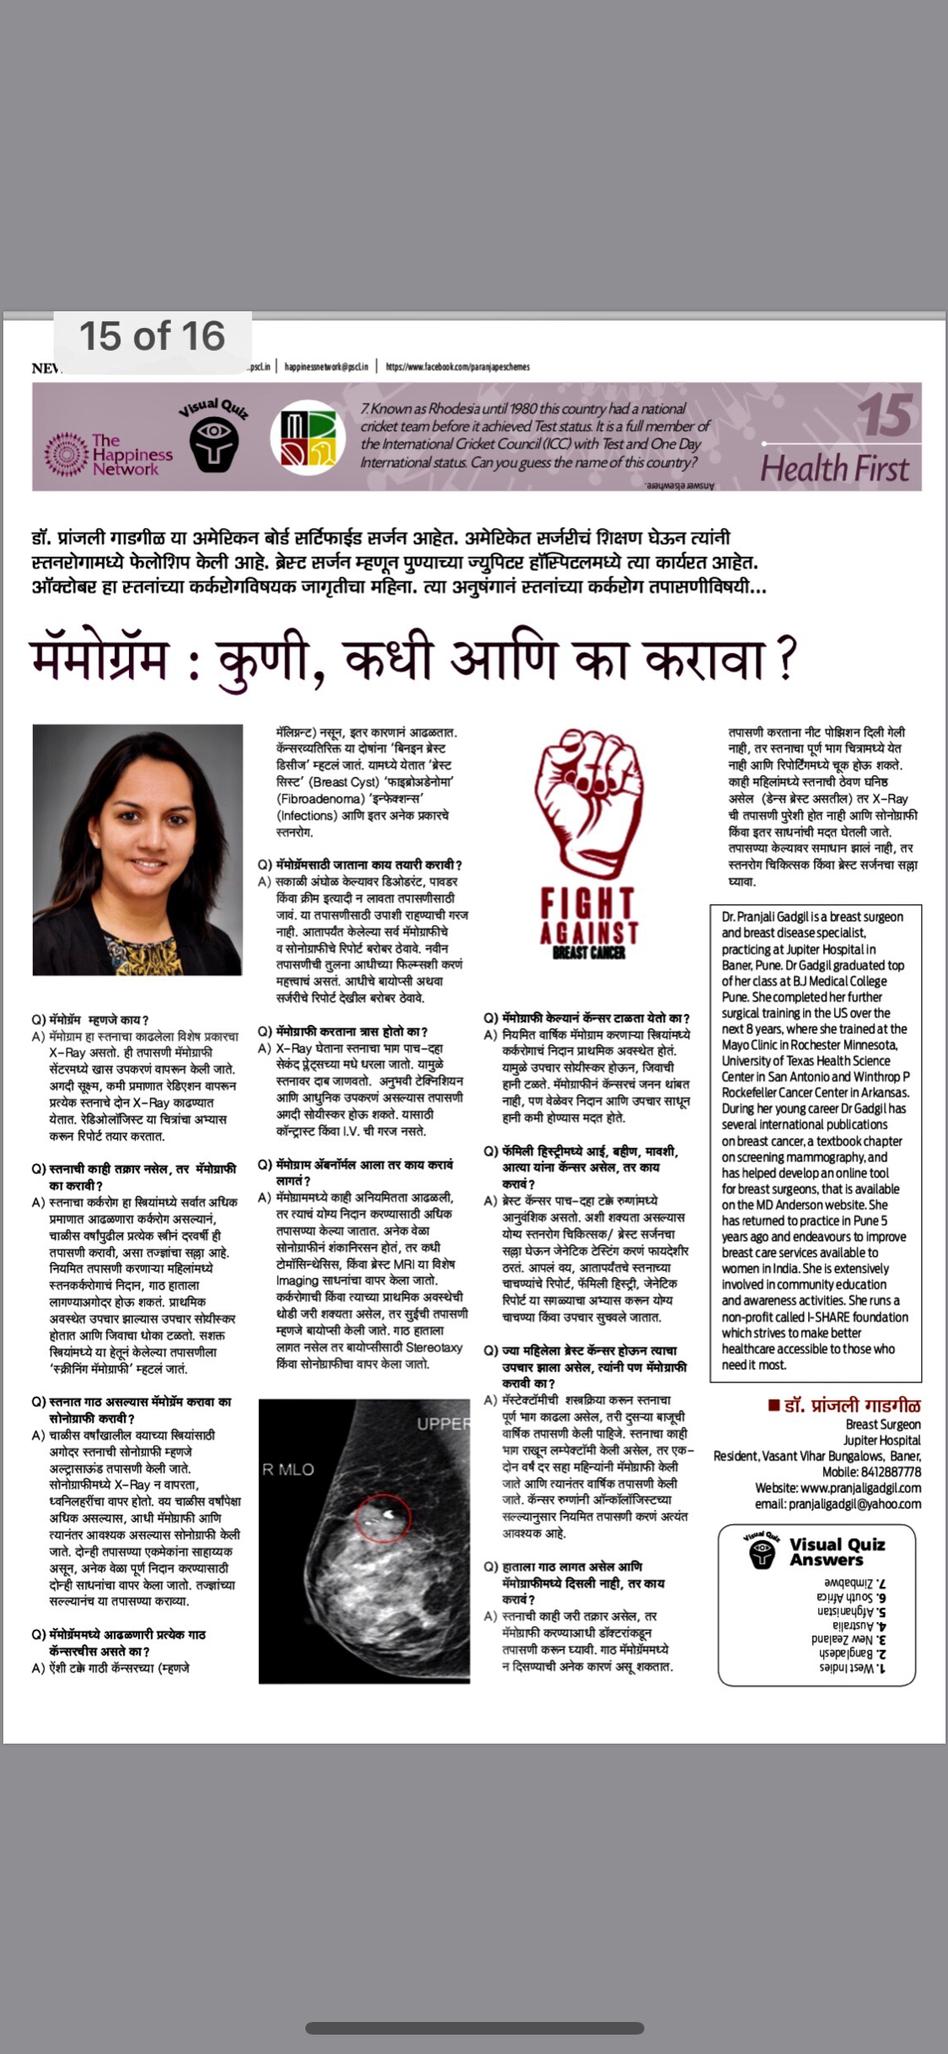 Marathi write-up on Mammography by Dr Pranjali Gadgil